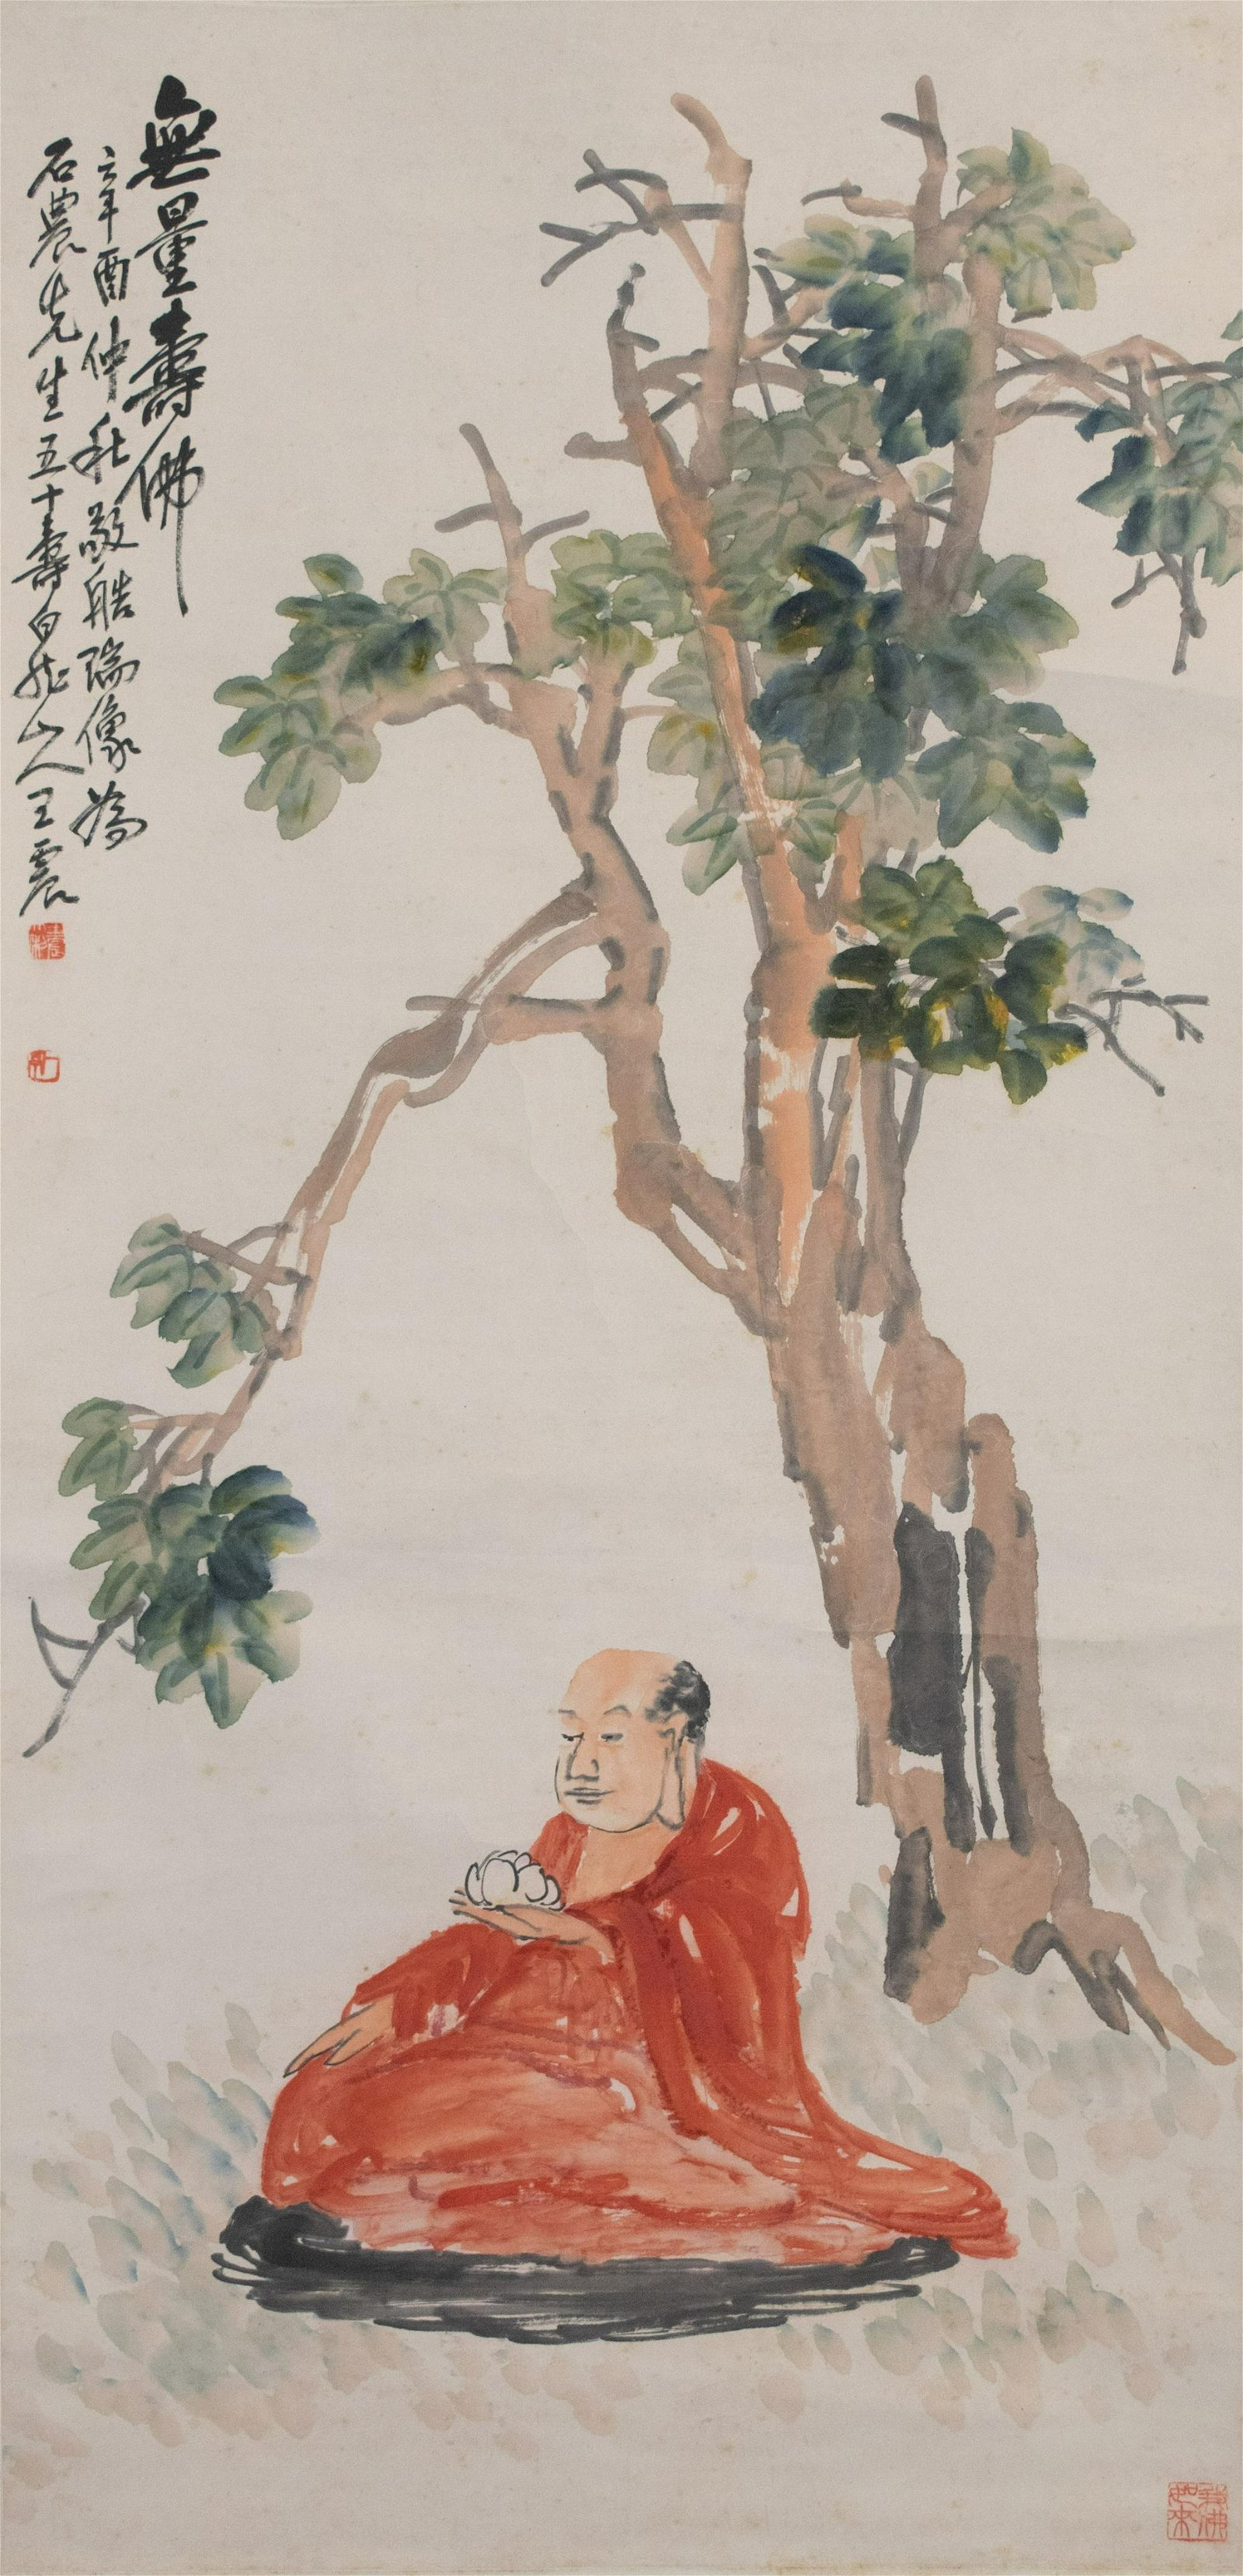 Chinese Painting of Red Robed Buddha, Wang Zhen